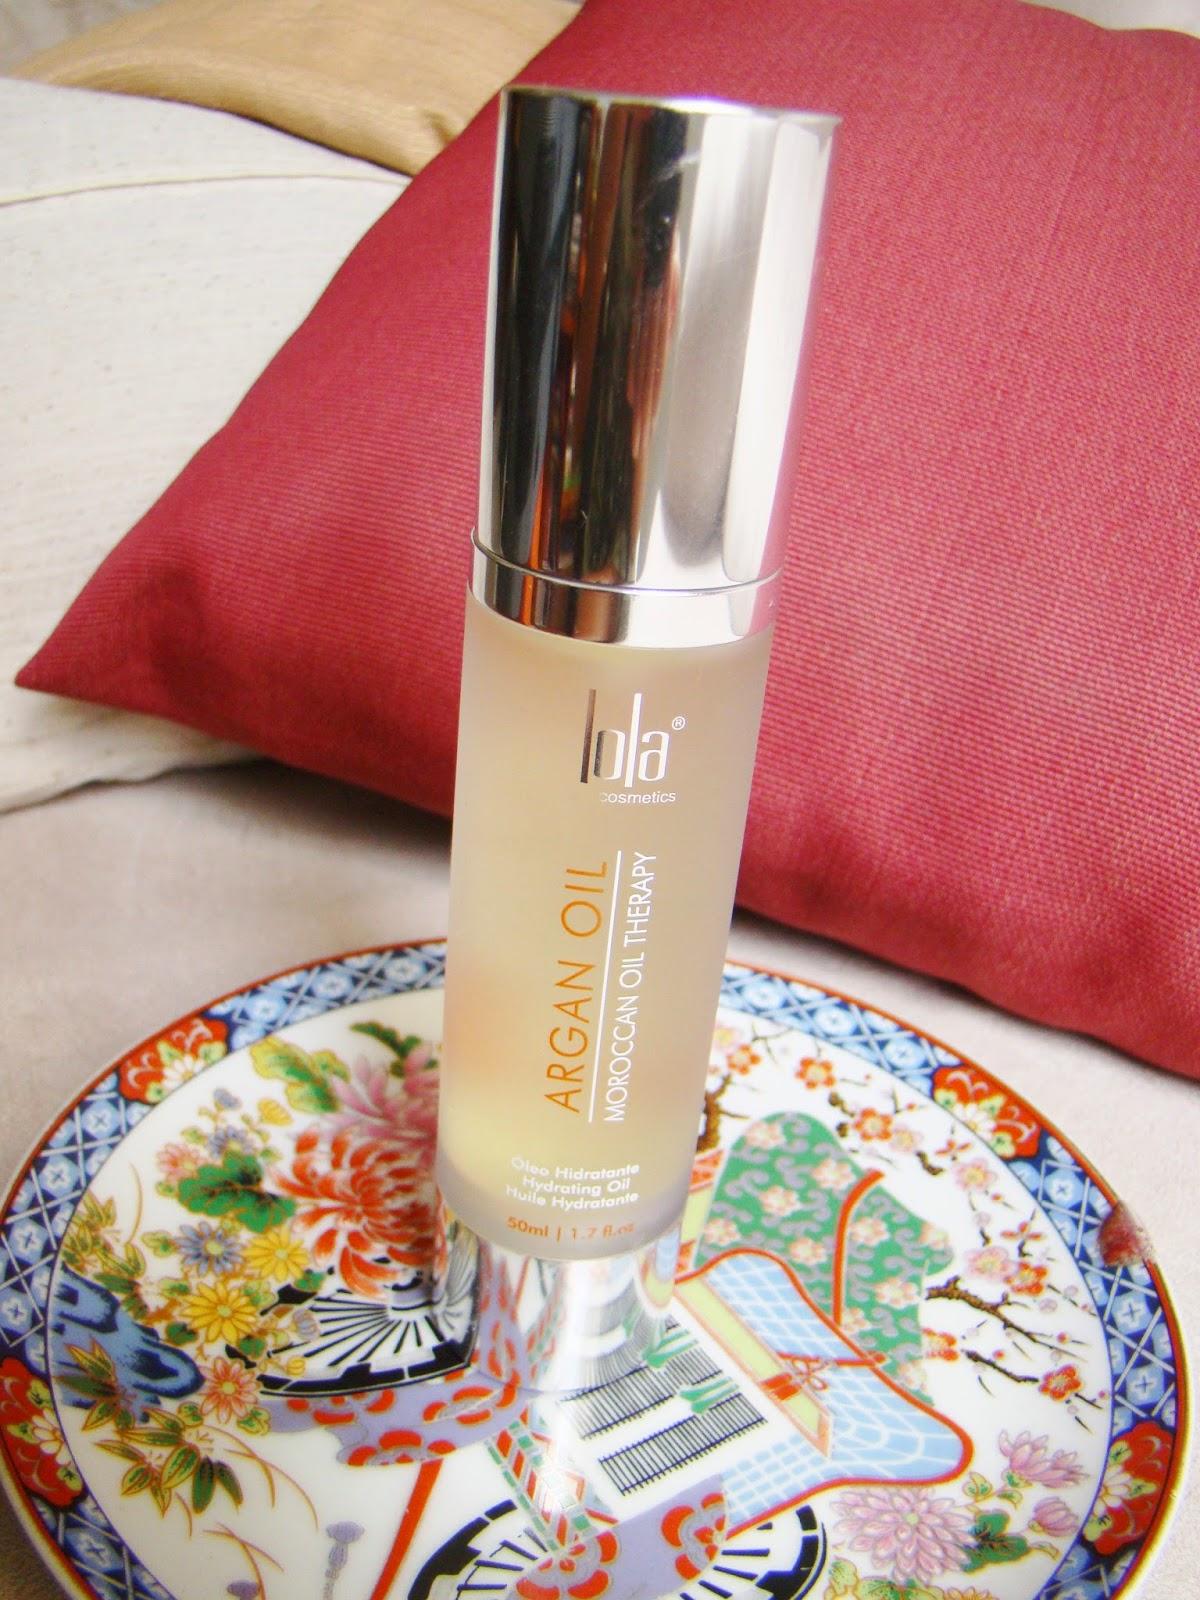 Argan Oil Moroccan Oil Lola Cosmetics